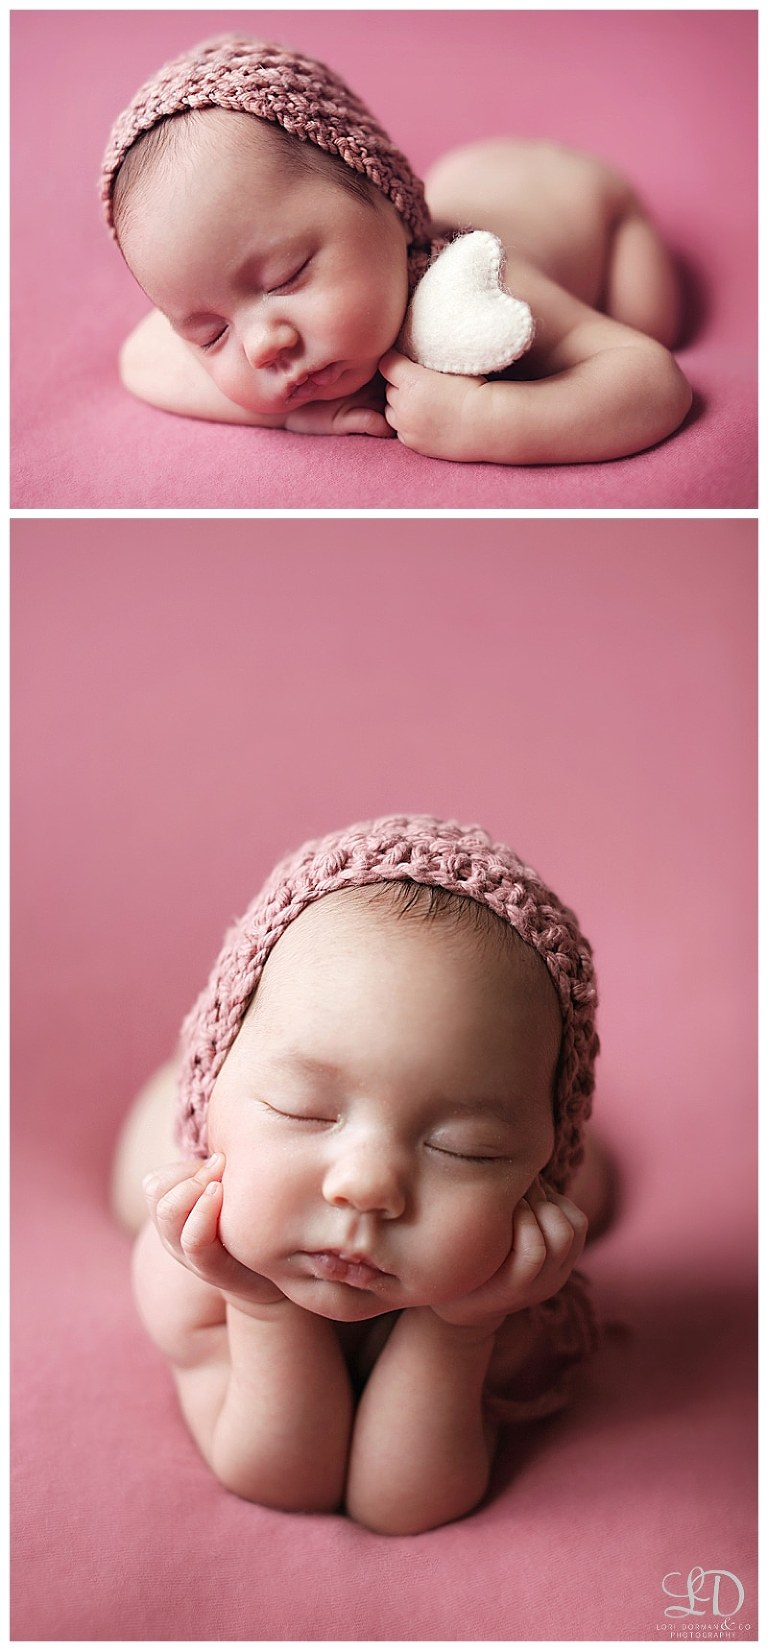 sweet maternity photoshoot-lori dorman photography-maternity boudoir-professional photographer_4727.jpg